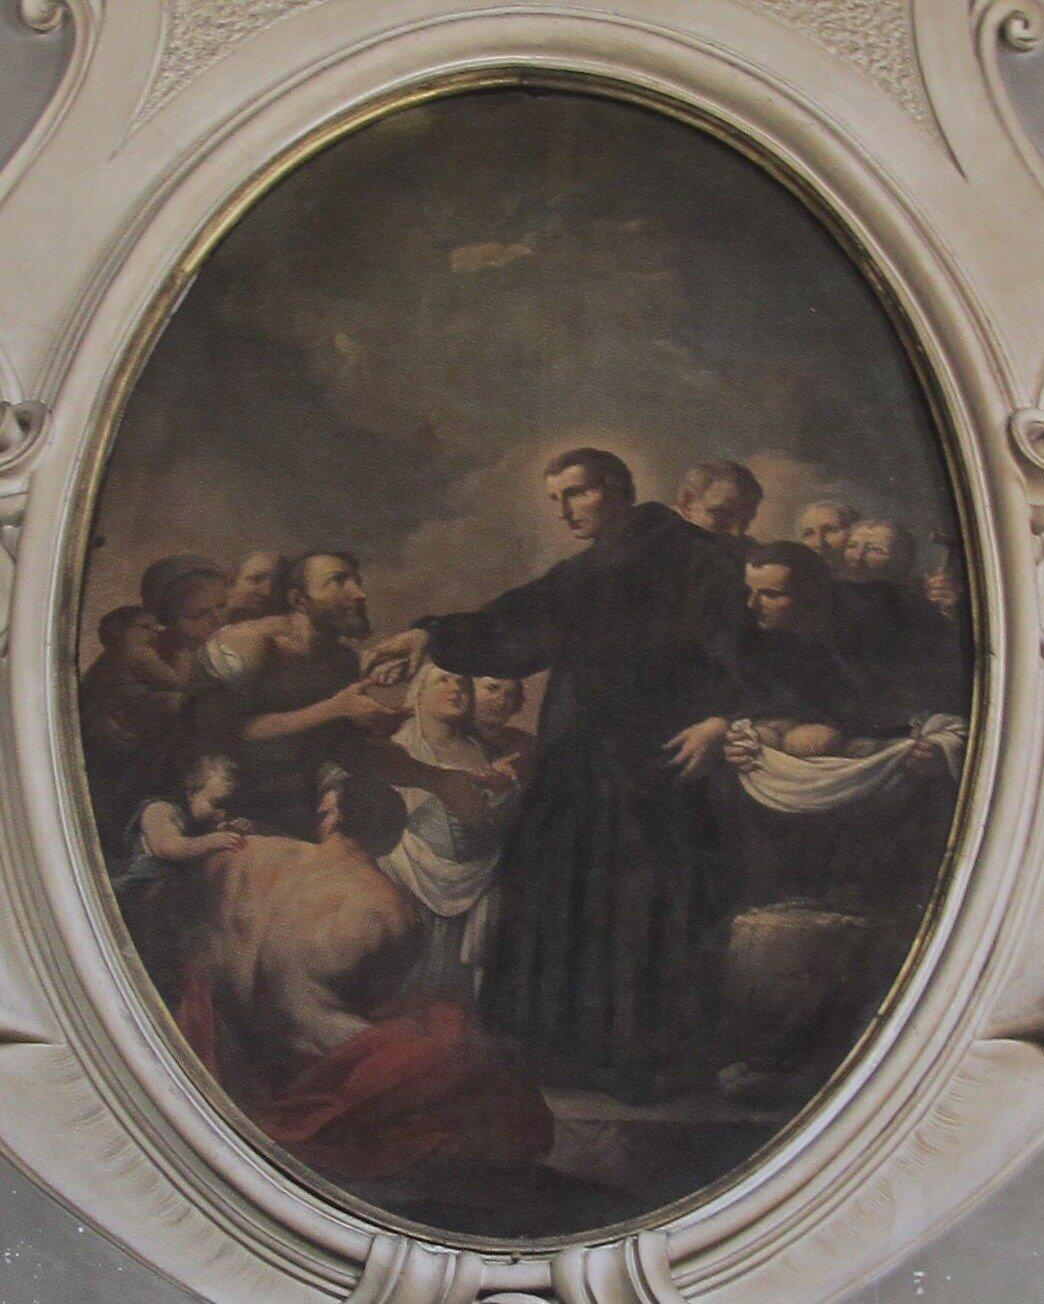 One of Ferroni's largescale ovals in the Atrium of San Giovanni di Dio